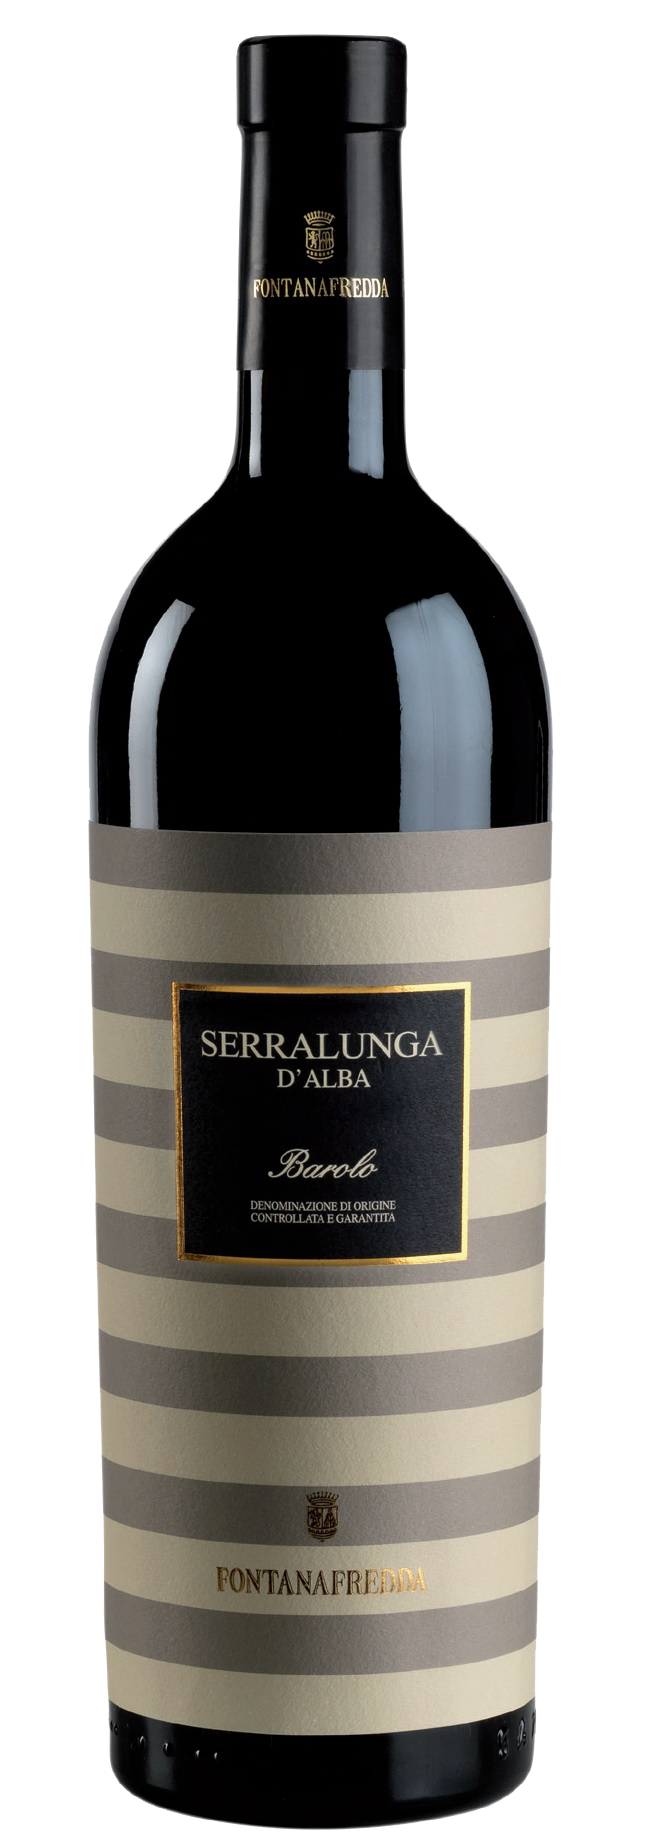 Barolo Seralunga d'Alba